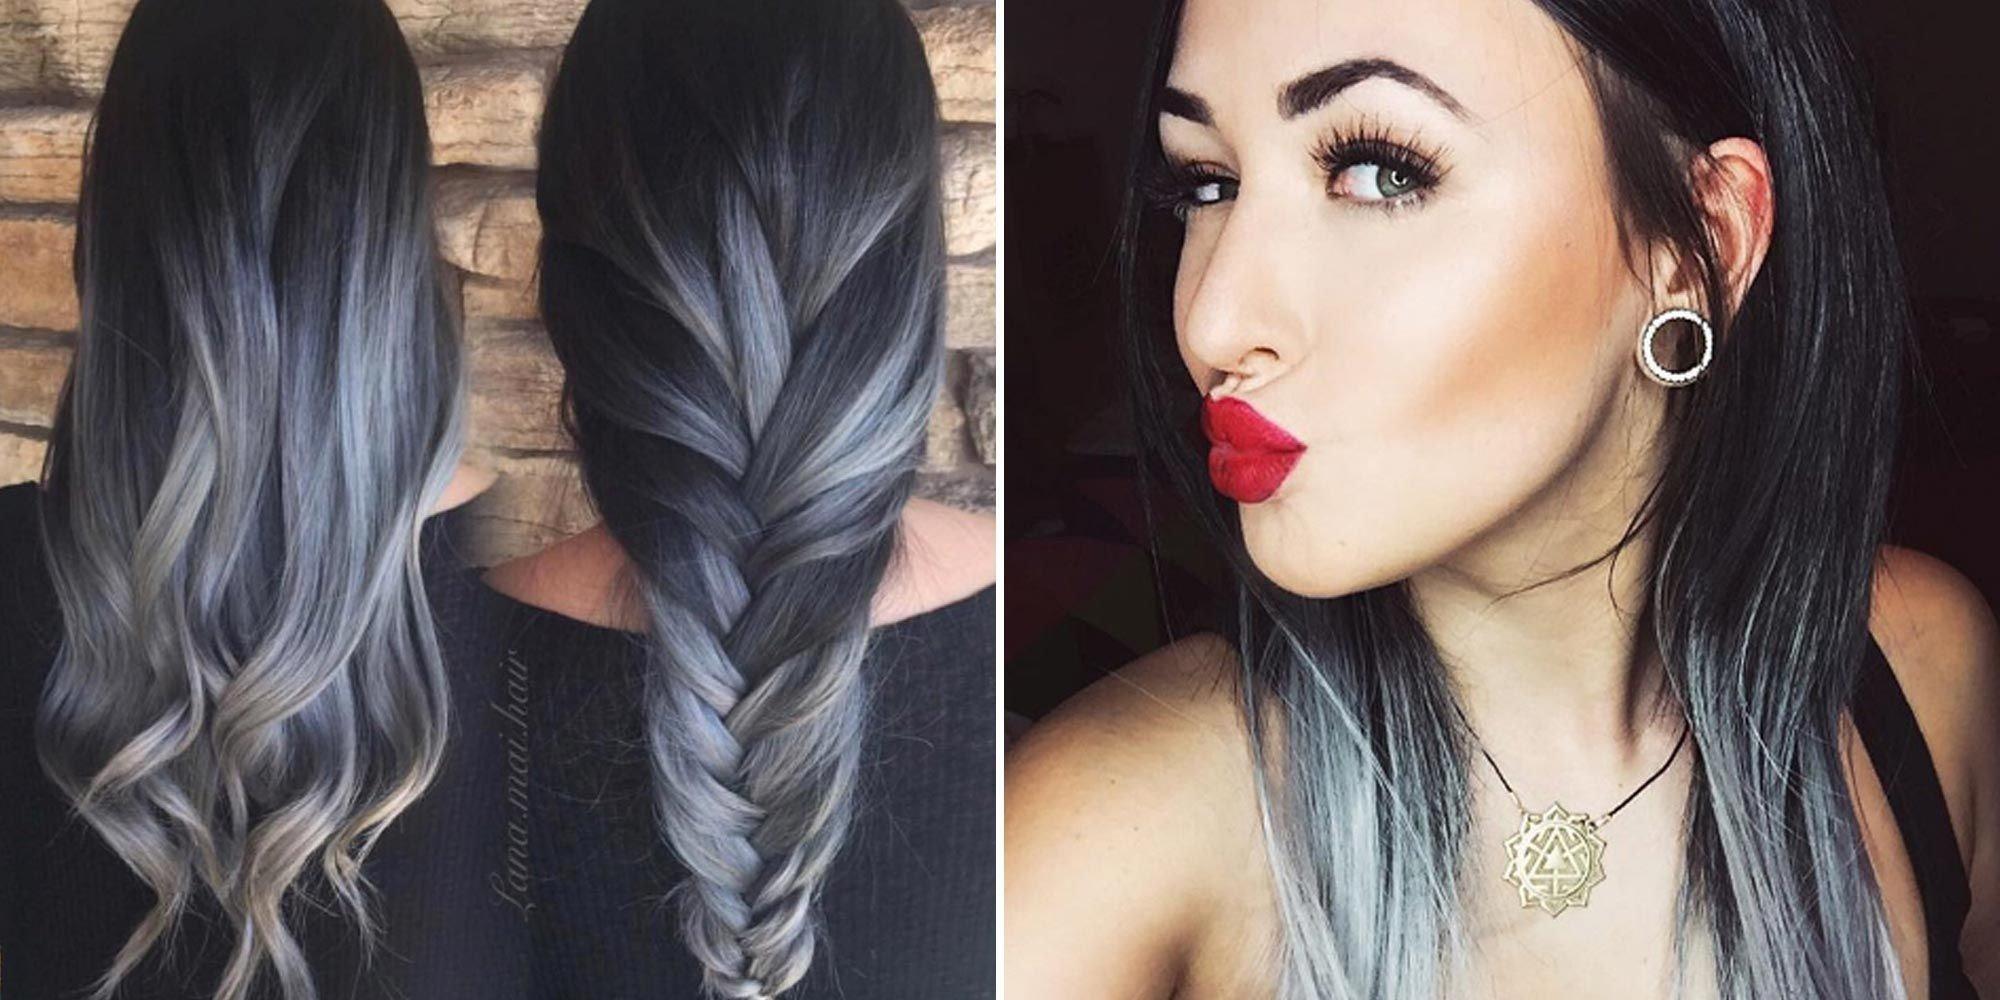 10 Awesome Hair Dye Ideas For Black Hair hair color ideas for 2018 best hair colors cosmopolitan 2 2021